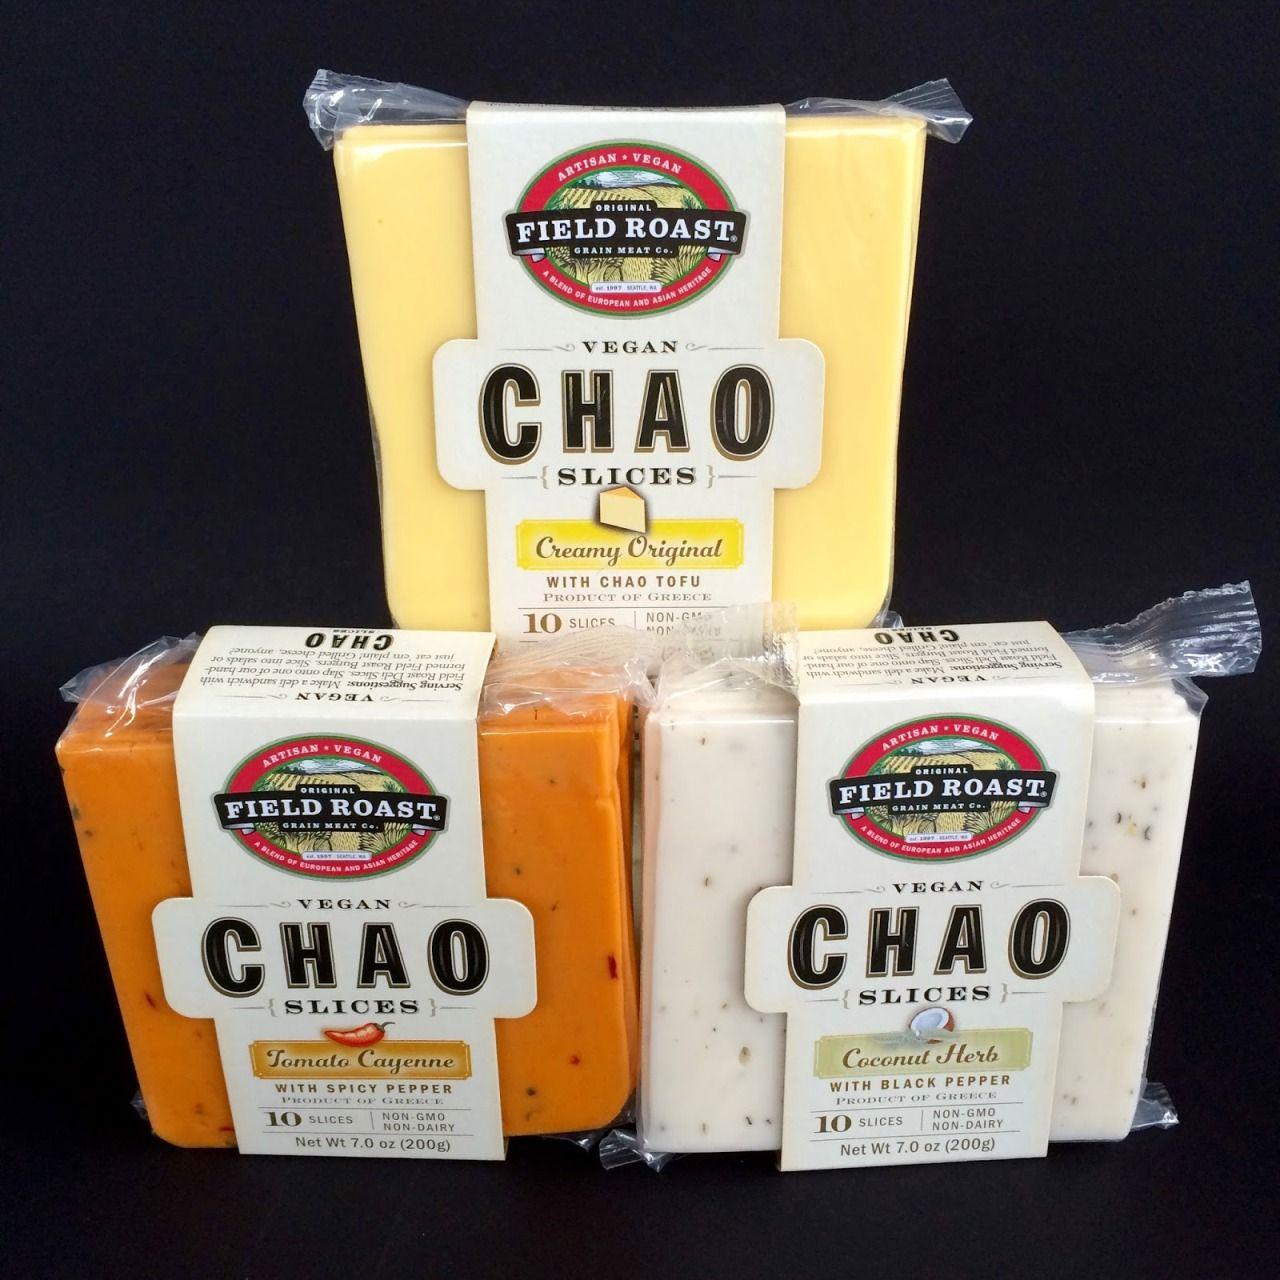 Veganize This Best Vegan Cheese Yet Best Vegan Cheese Field Roast Vegan Grilling